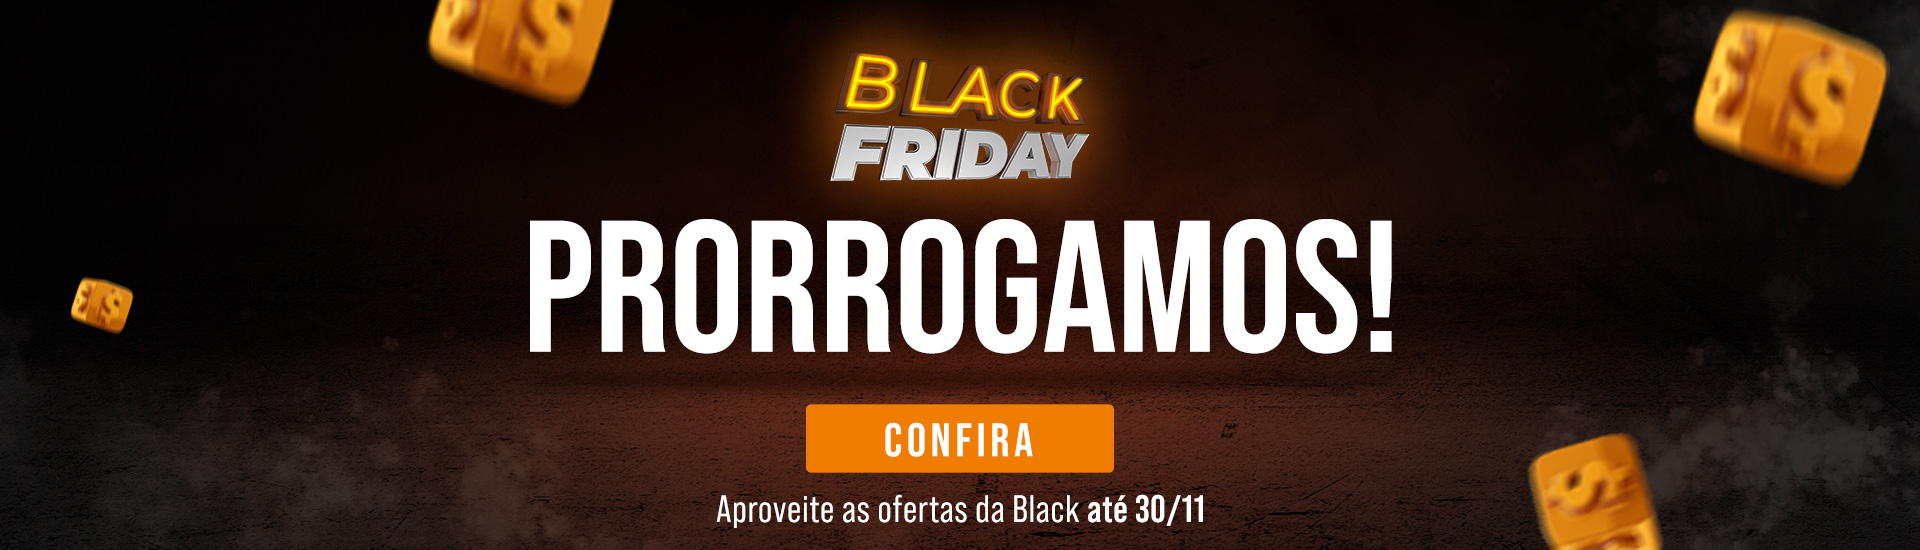 Black Prorroga Tentativa2